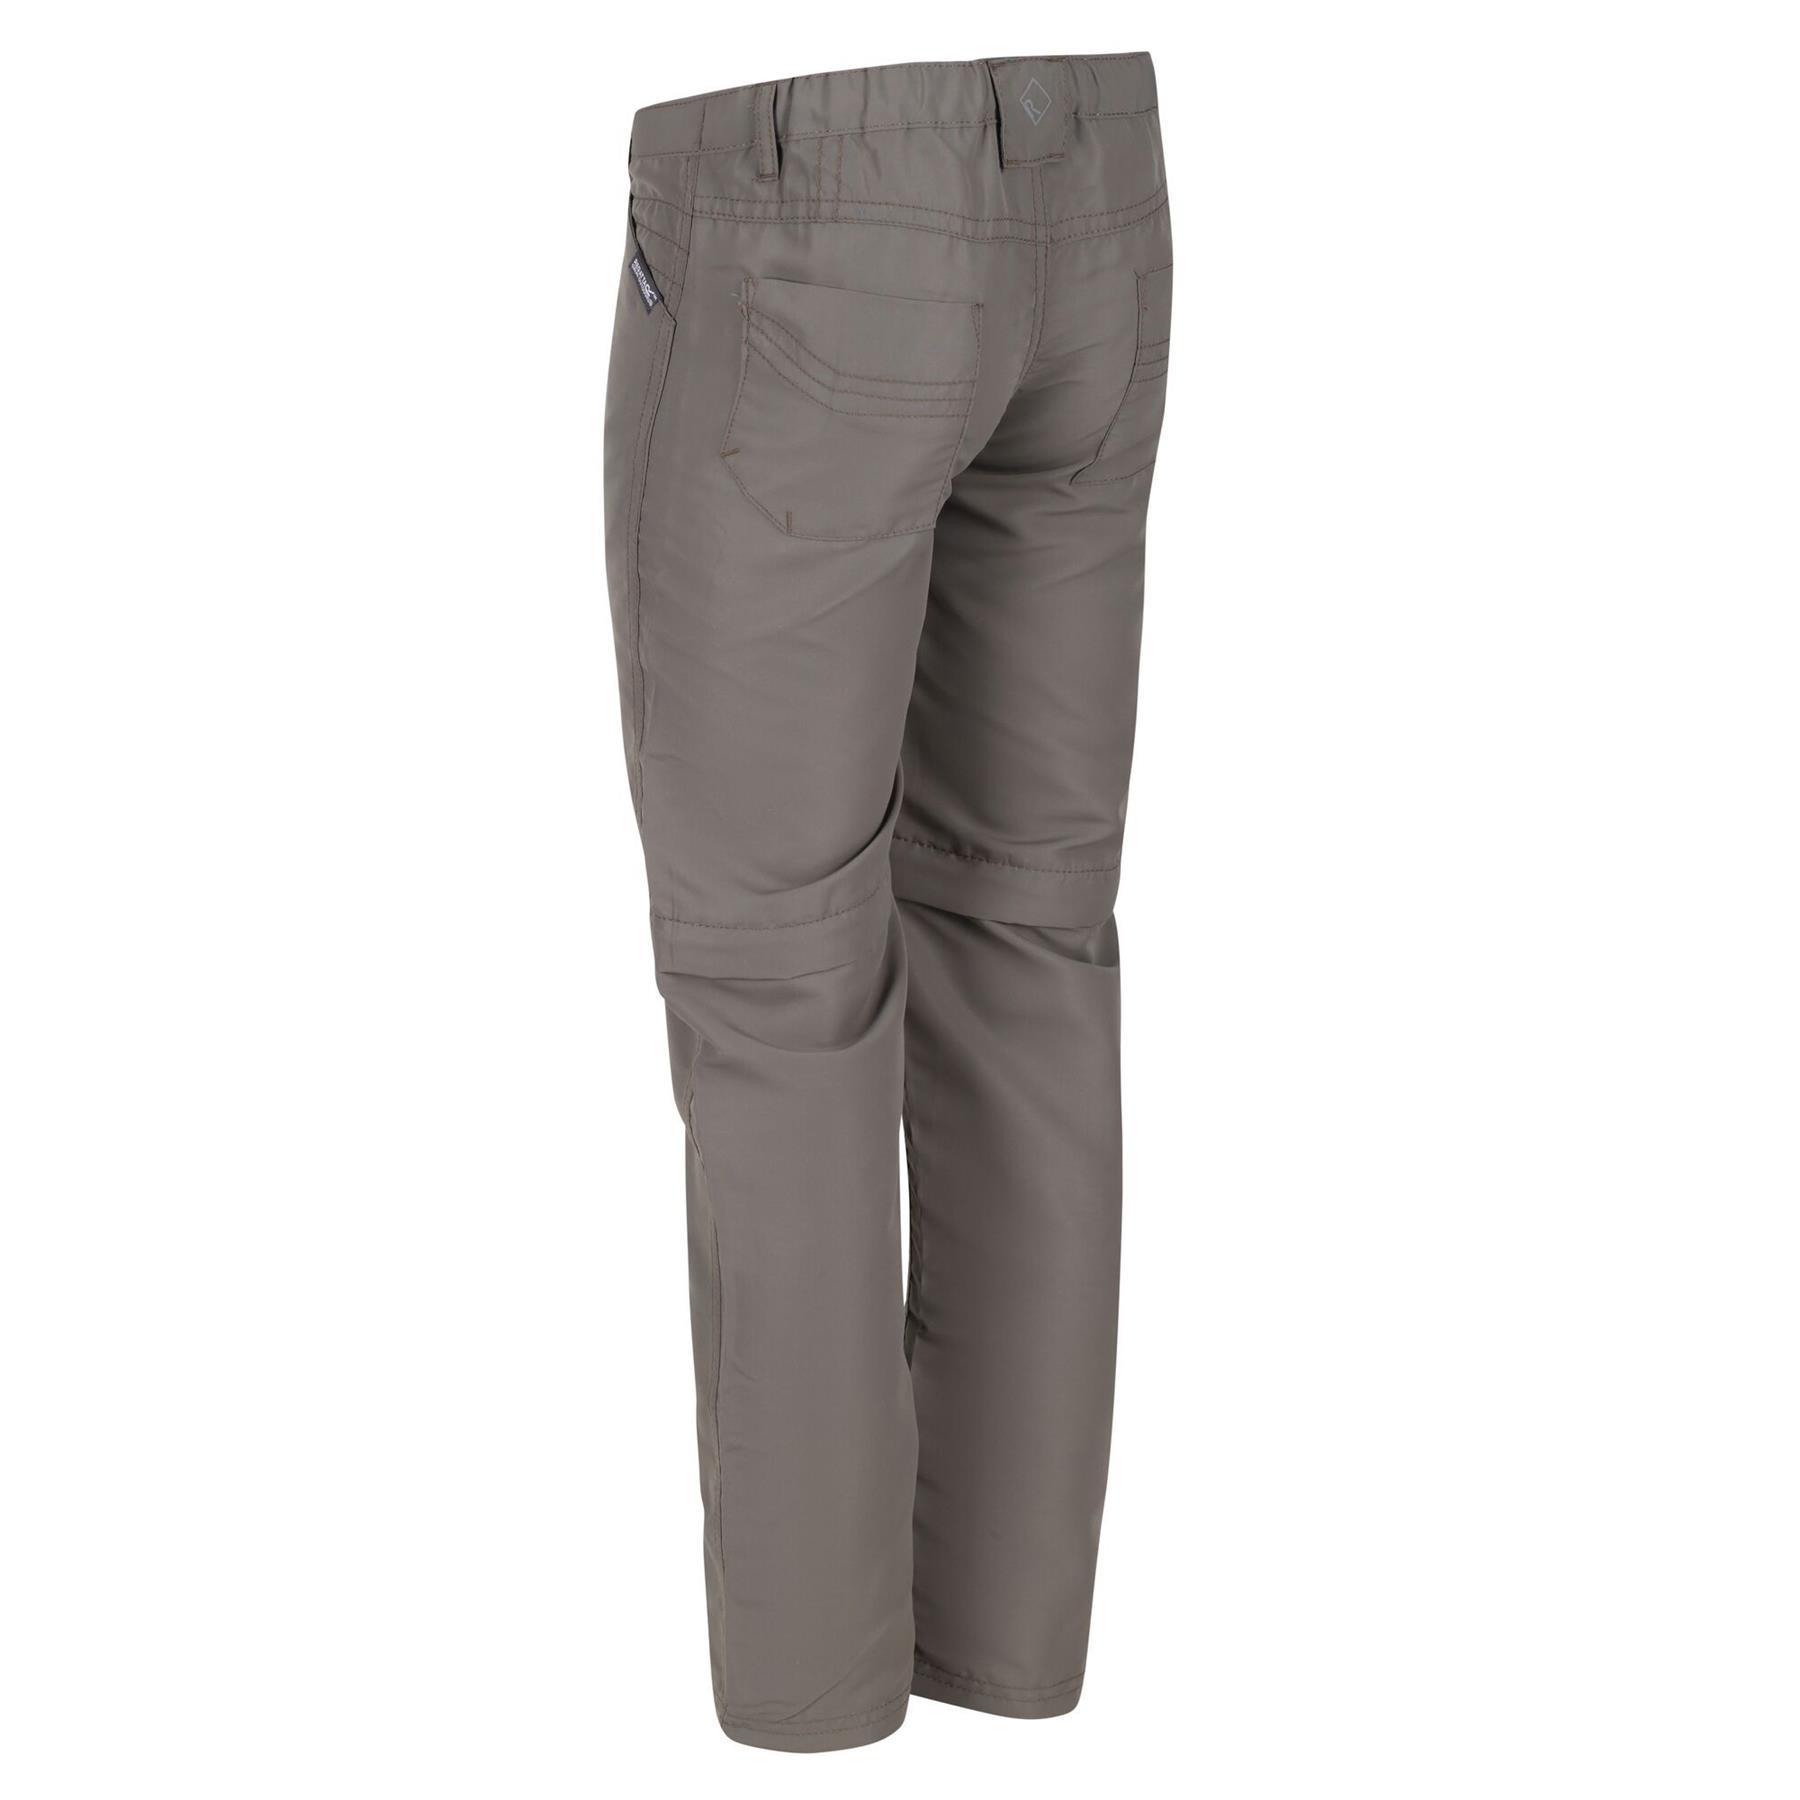 miniatuur 10 - Regatta Kids Sorcer II Zip Off Convertible Trousers Boys Girls